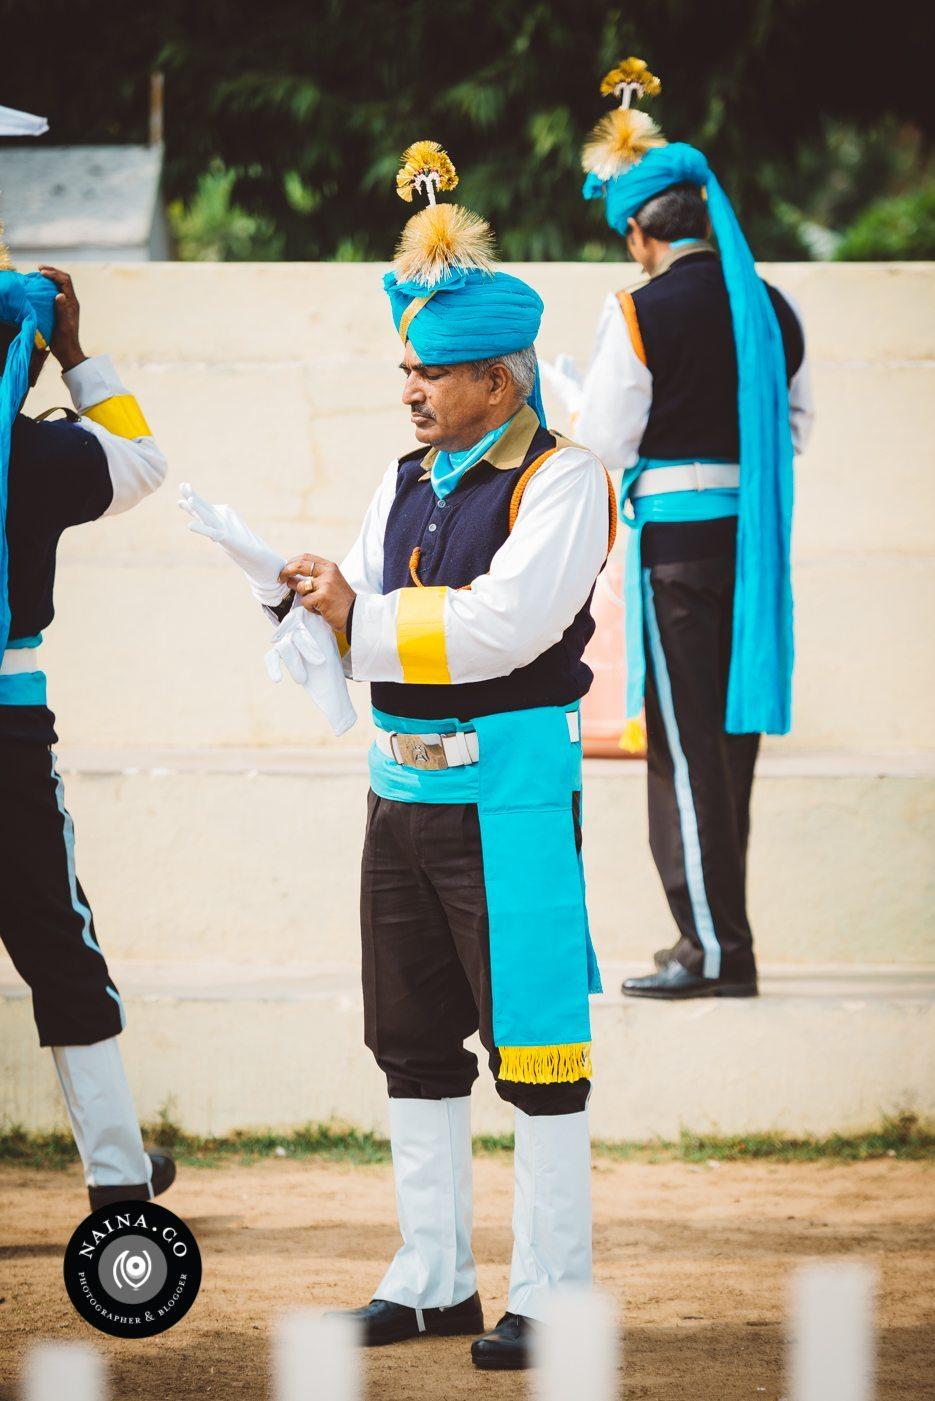 Naina.co-Raconteuse-Visuelle-Photographer-Blogger-Storyteller-Luxury-Lifestyle-January-2015-St.Regis-Polo-Cup-Maharaja-Jaipur-EyesForStreetStyle-01